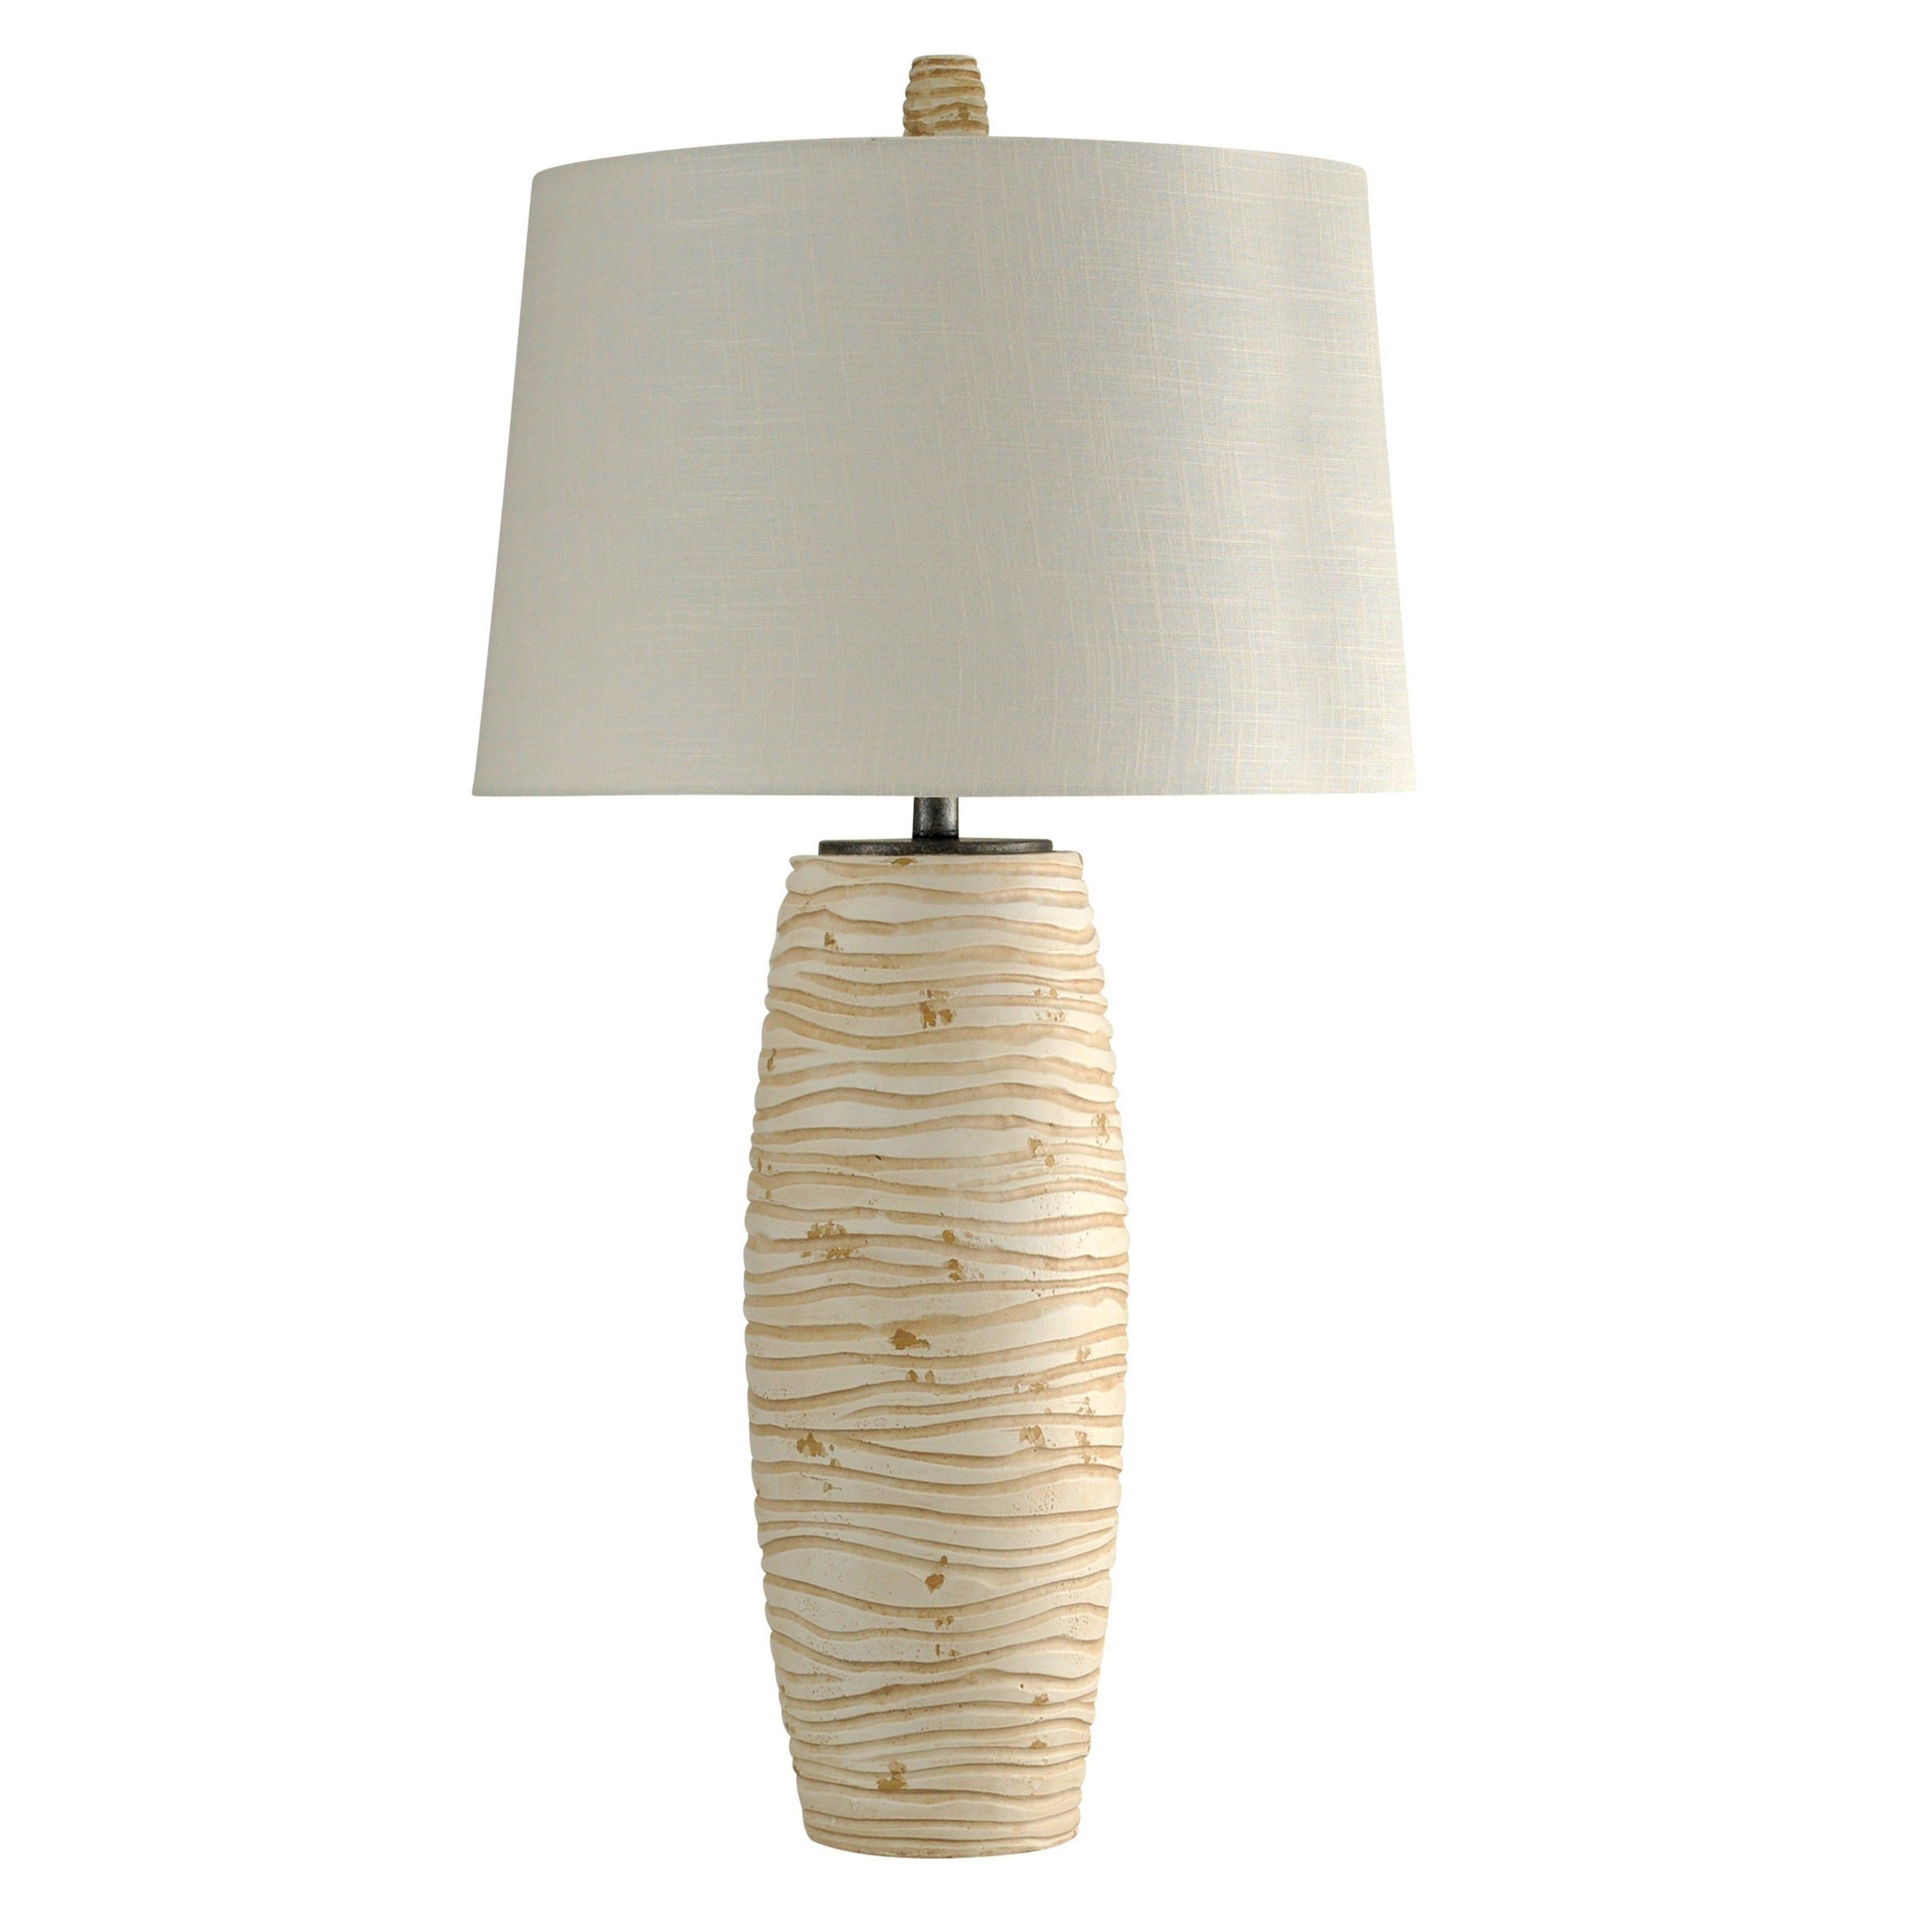 William Magnum Waxham Beige Table Lamp White Hardback Fabric